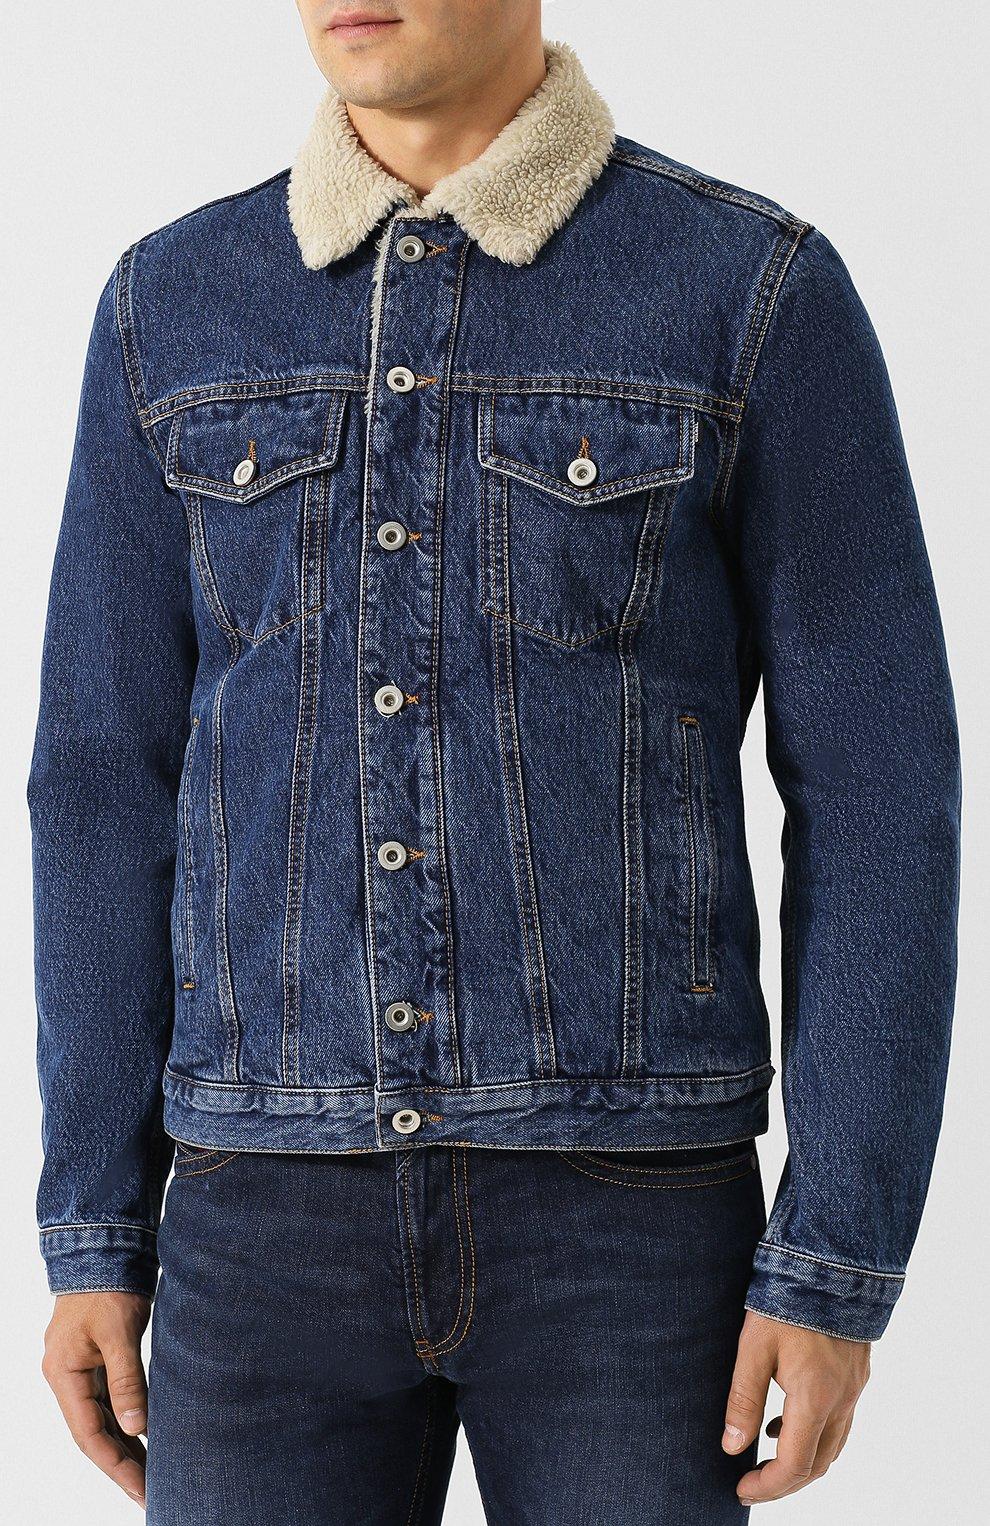 Джинсовая куртка на пуговицах Diesel синяя | Фото №3